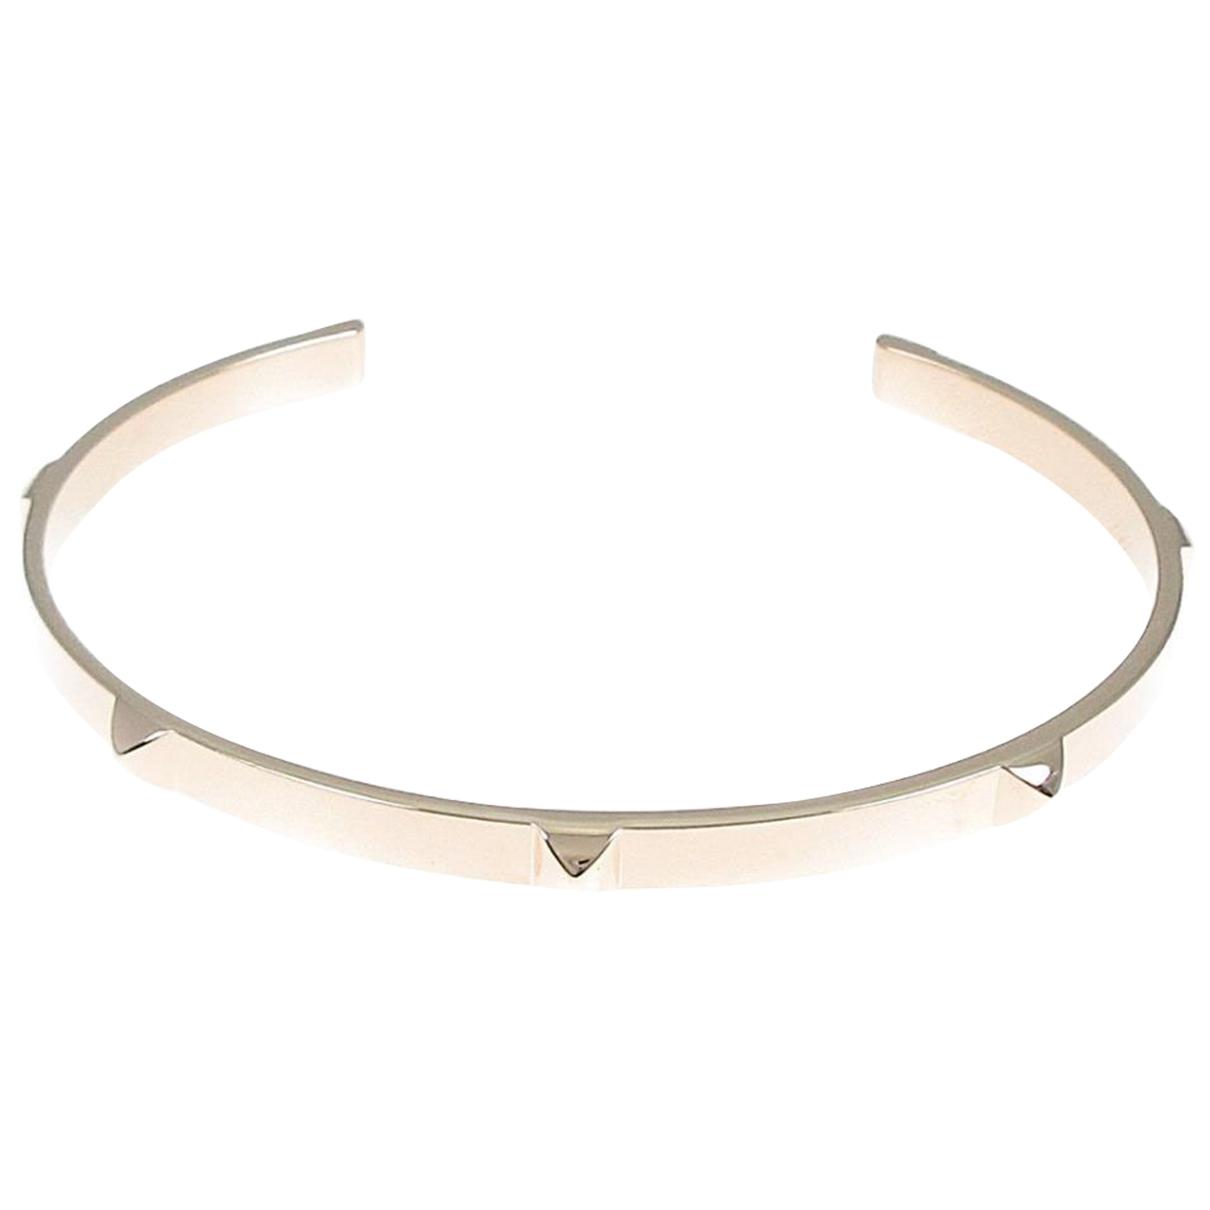 Hermes - Bracelet   pour femme en metal - argente